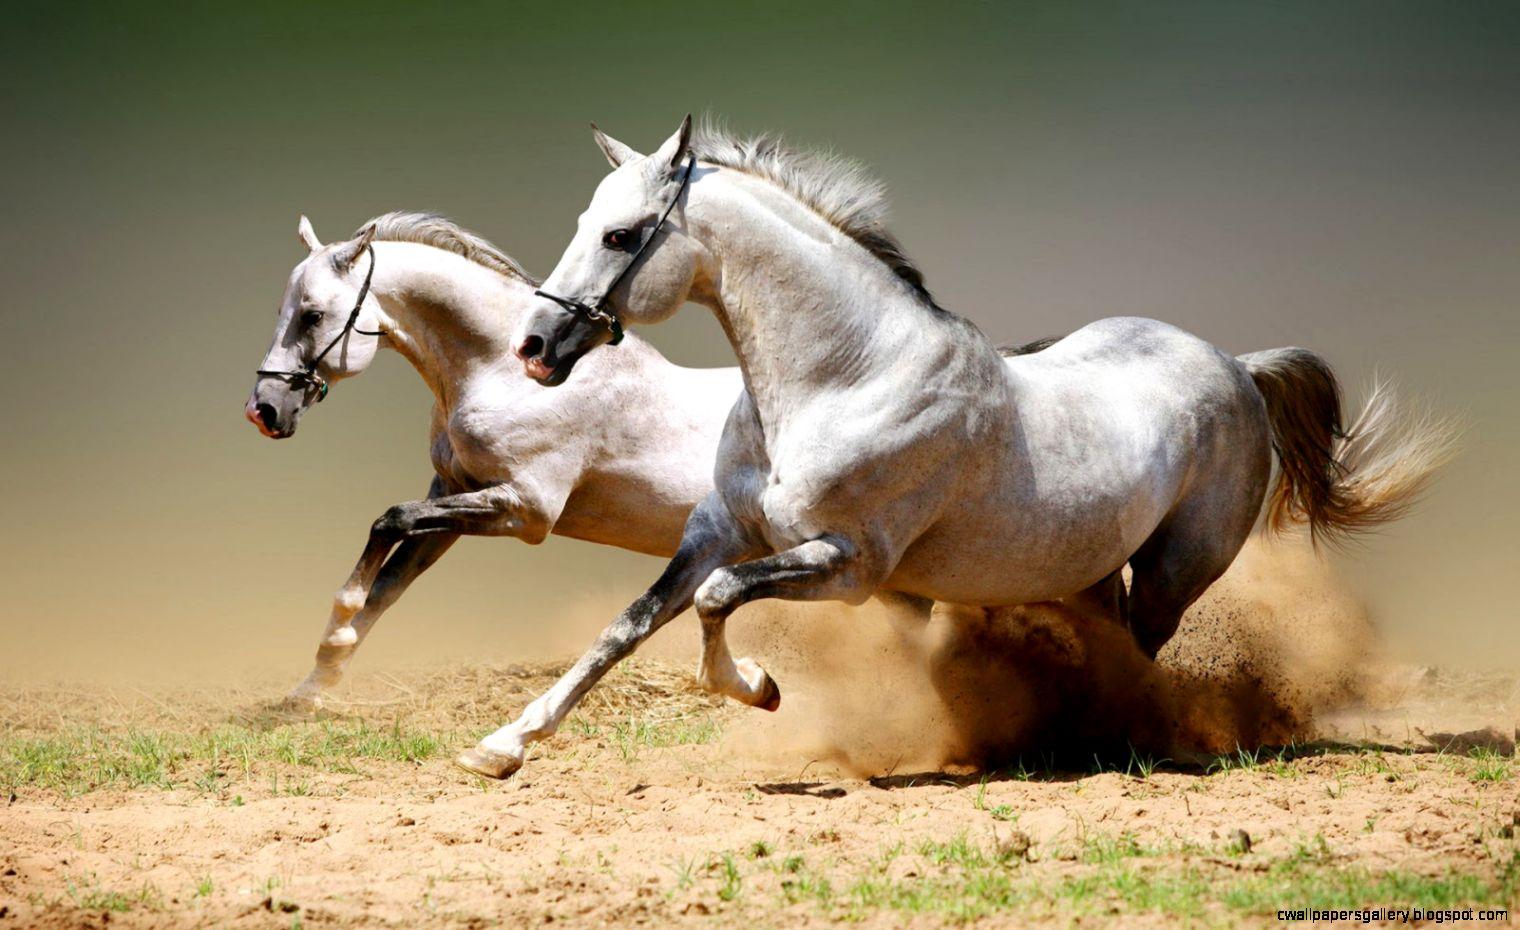 White Running Horses Wallpaper | Wallpapers Gallery - photo#28